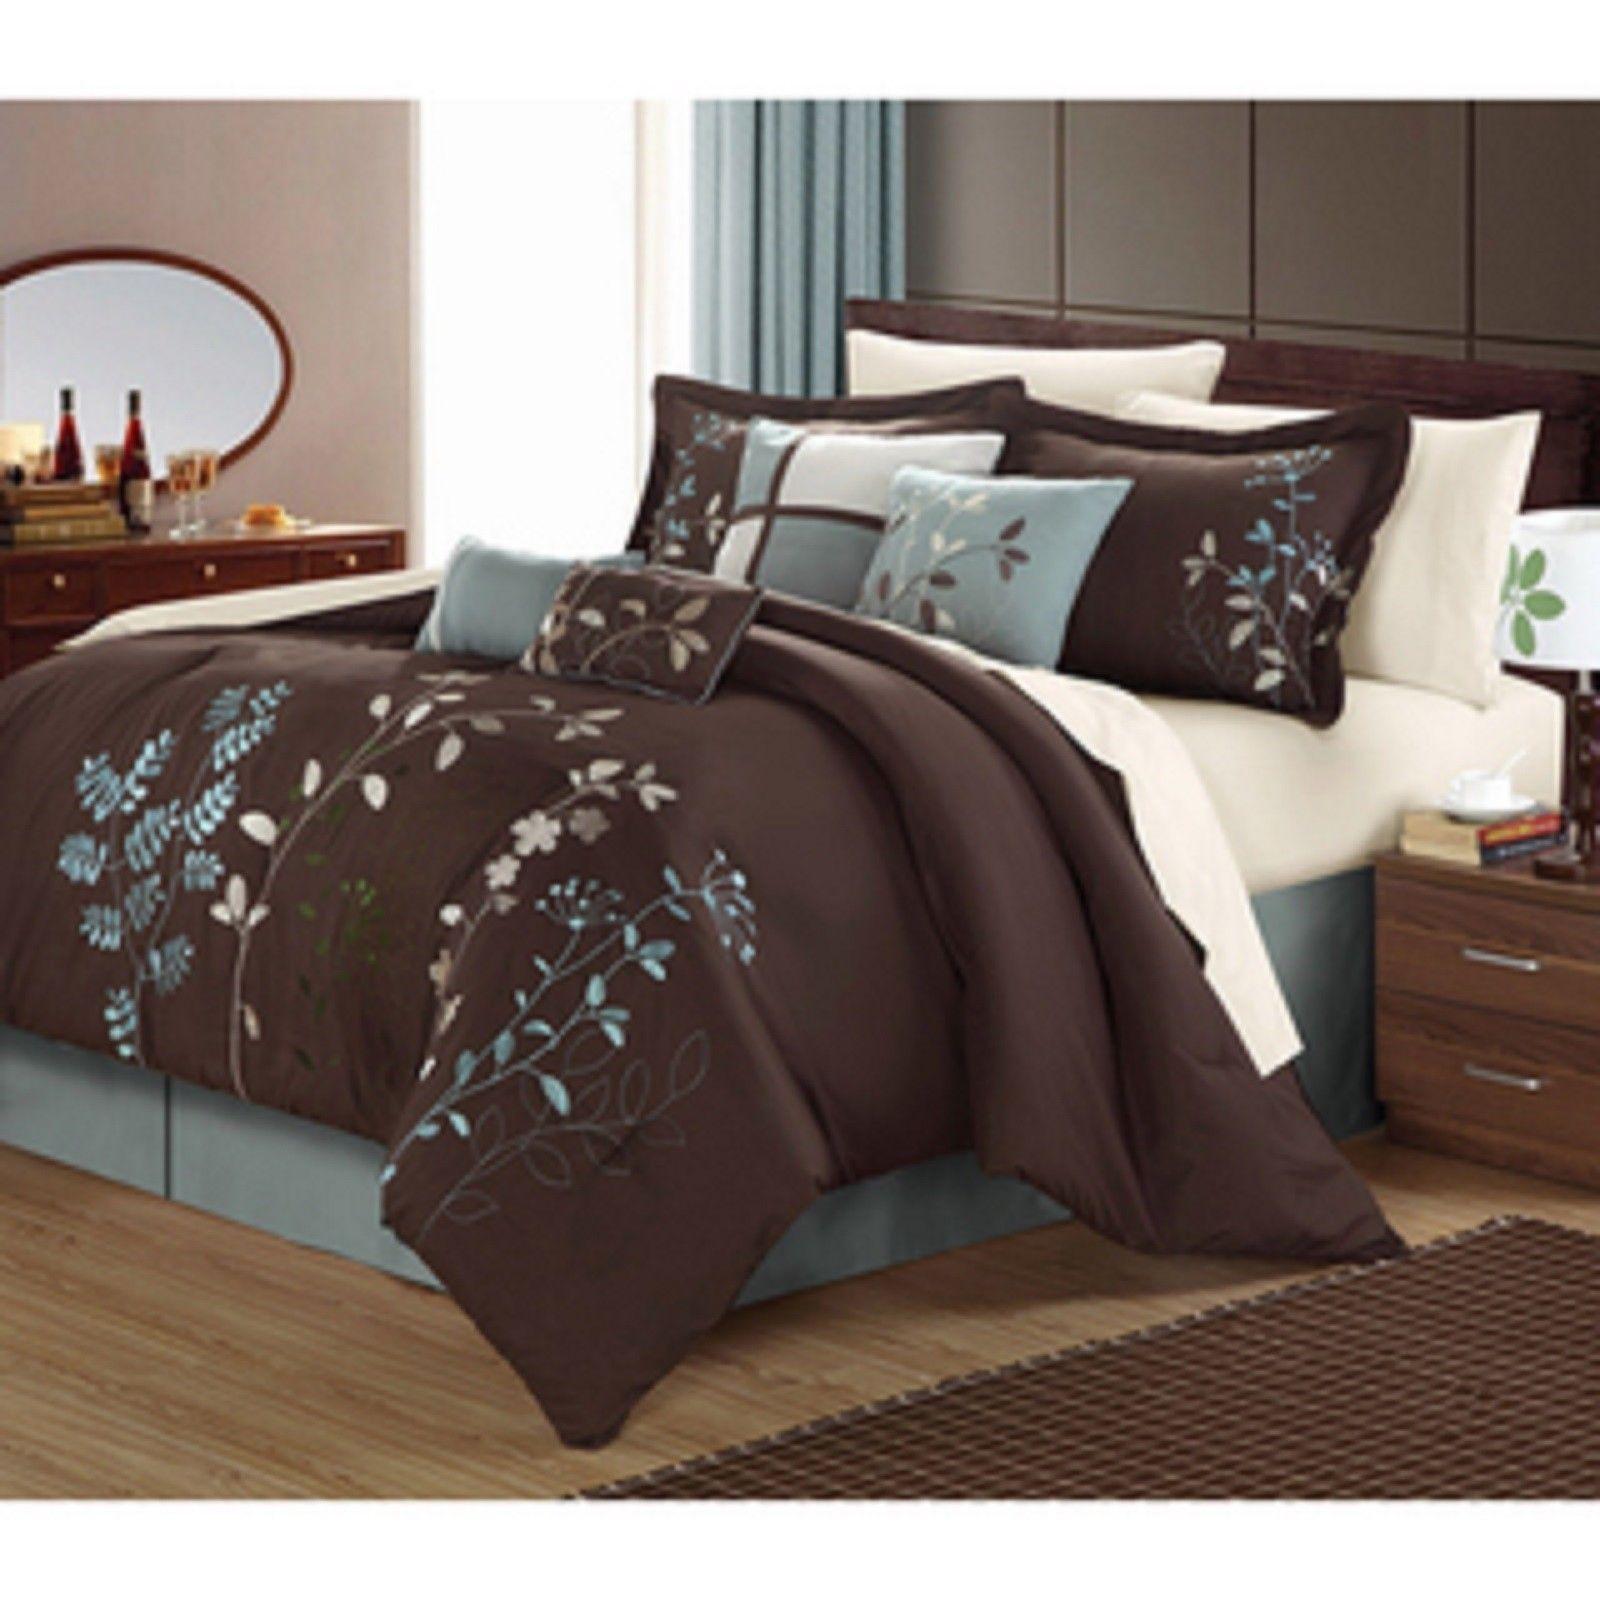 luxury bedding sets modern comforter